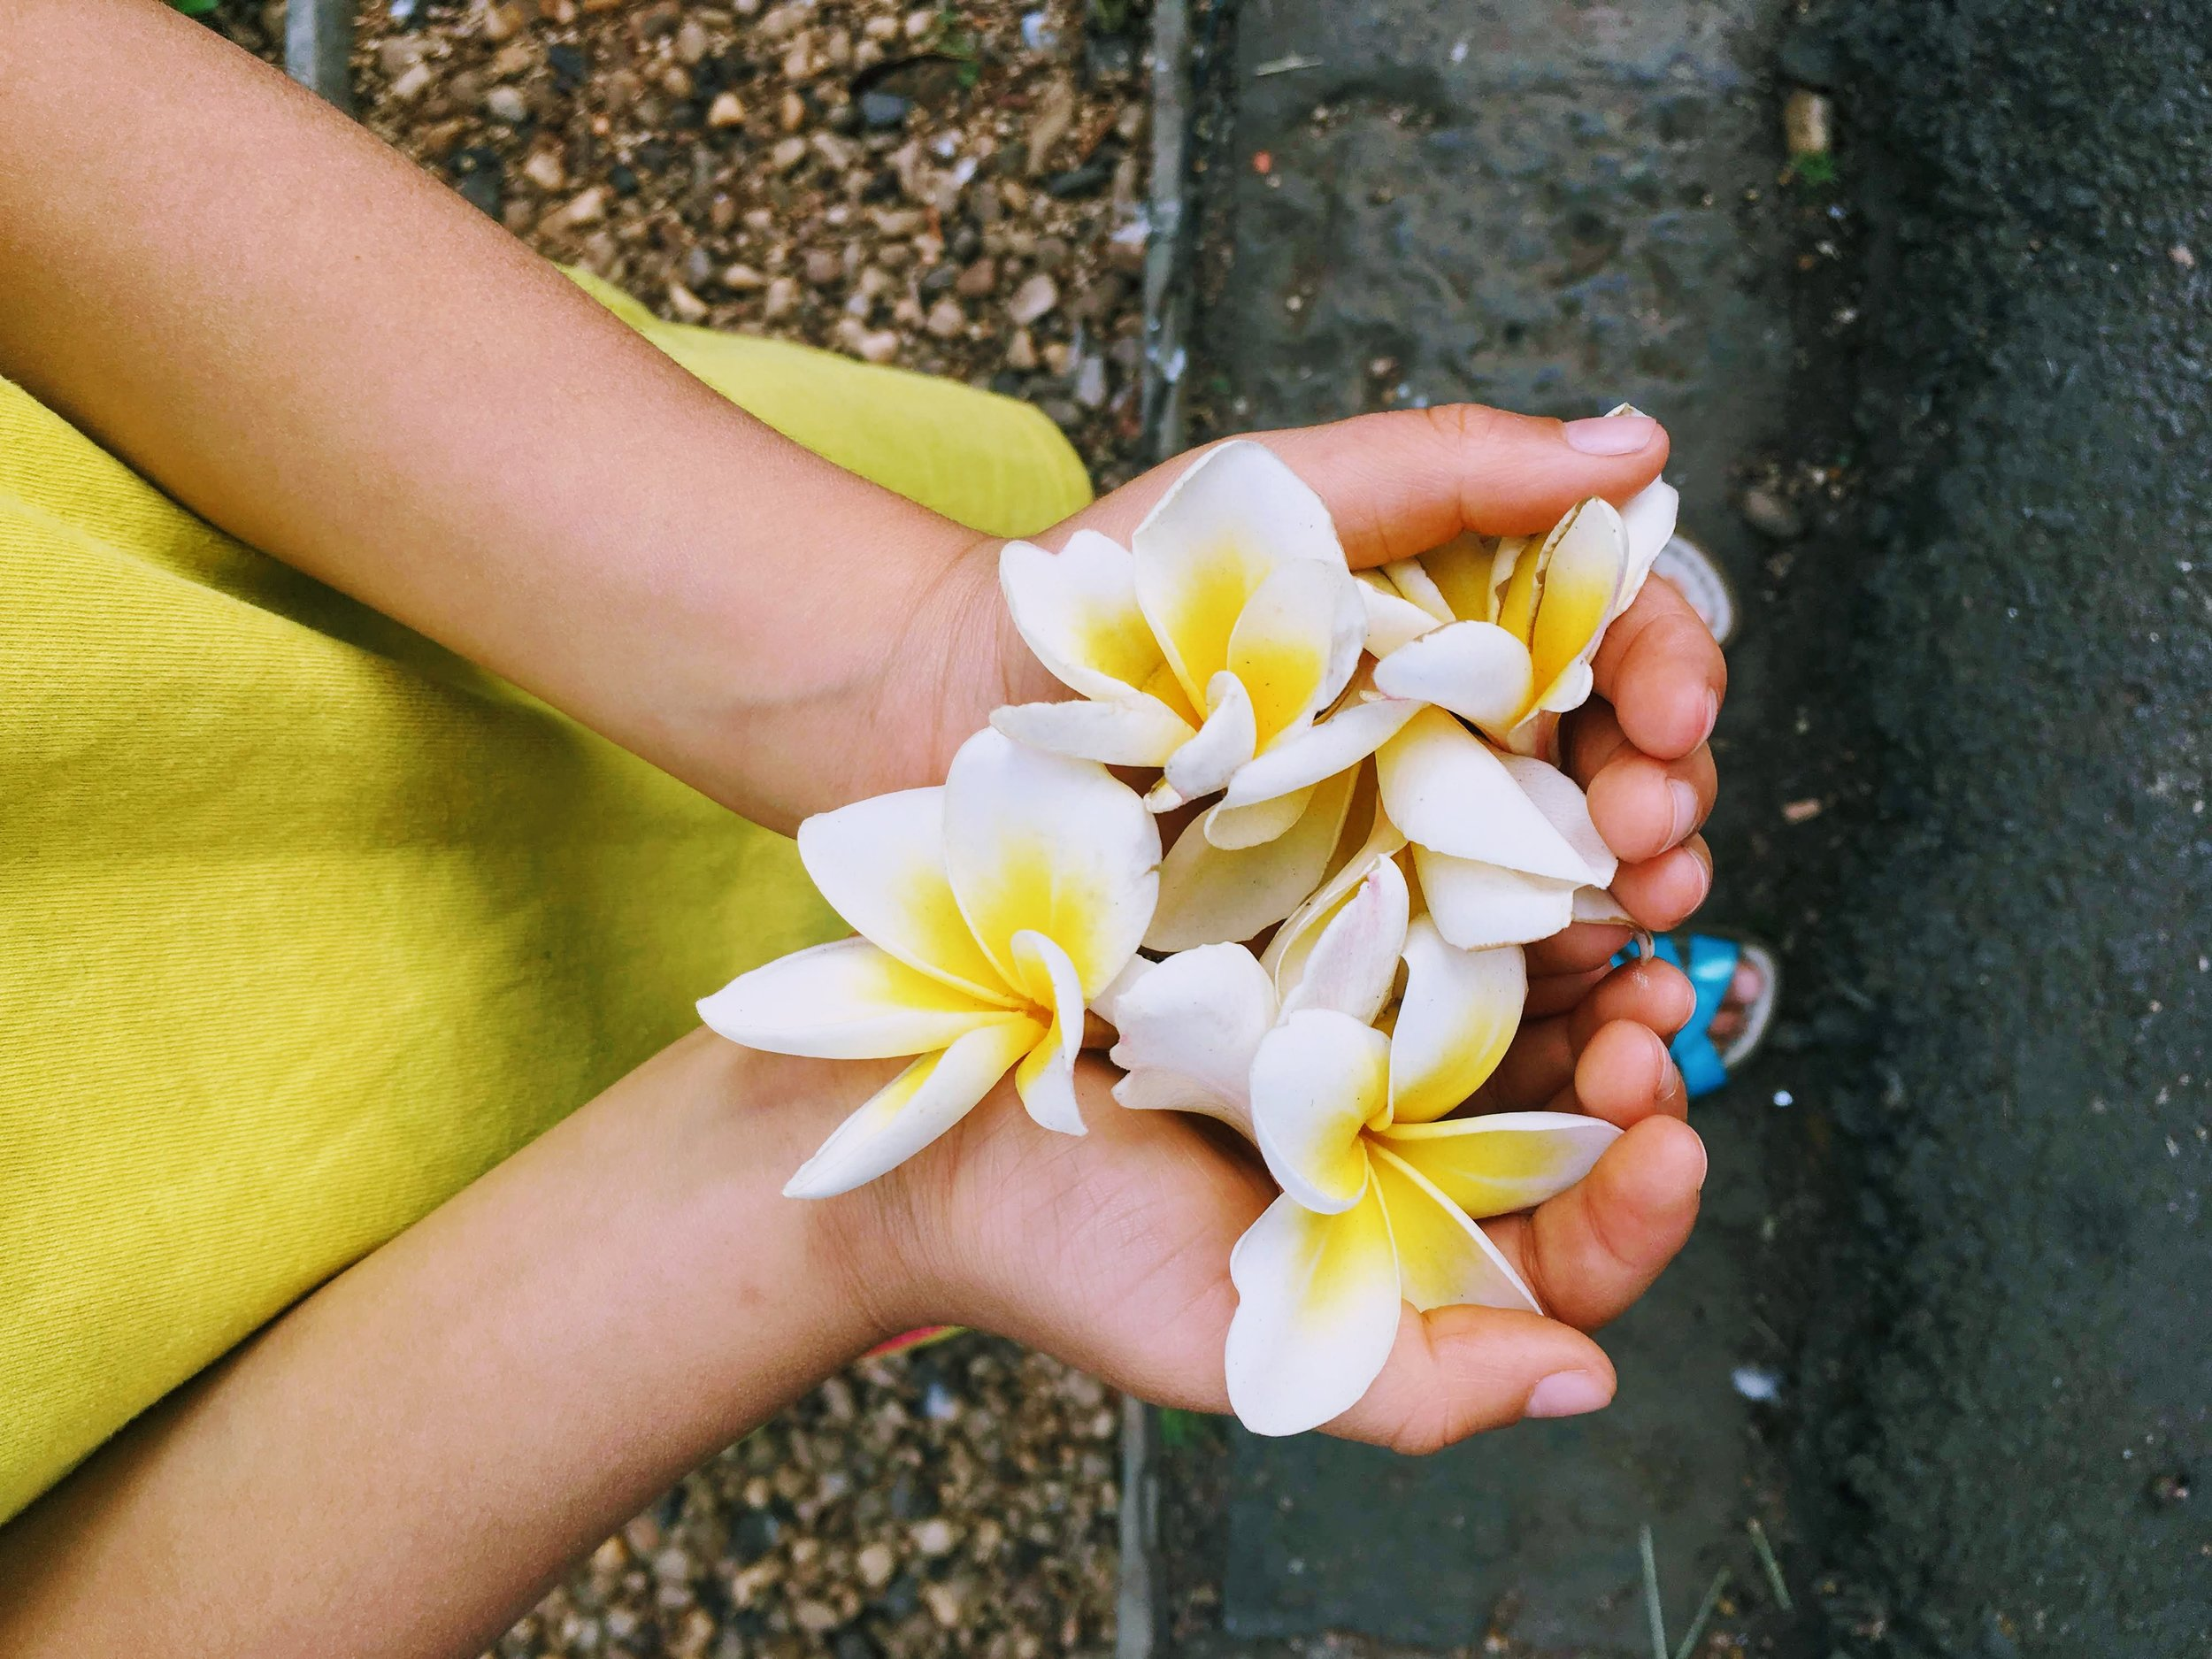 zeenat flowers in hand.JPG